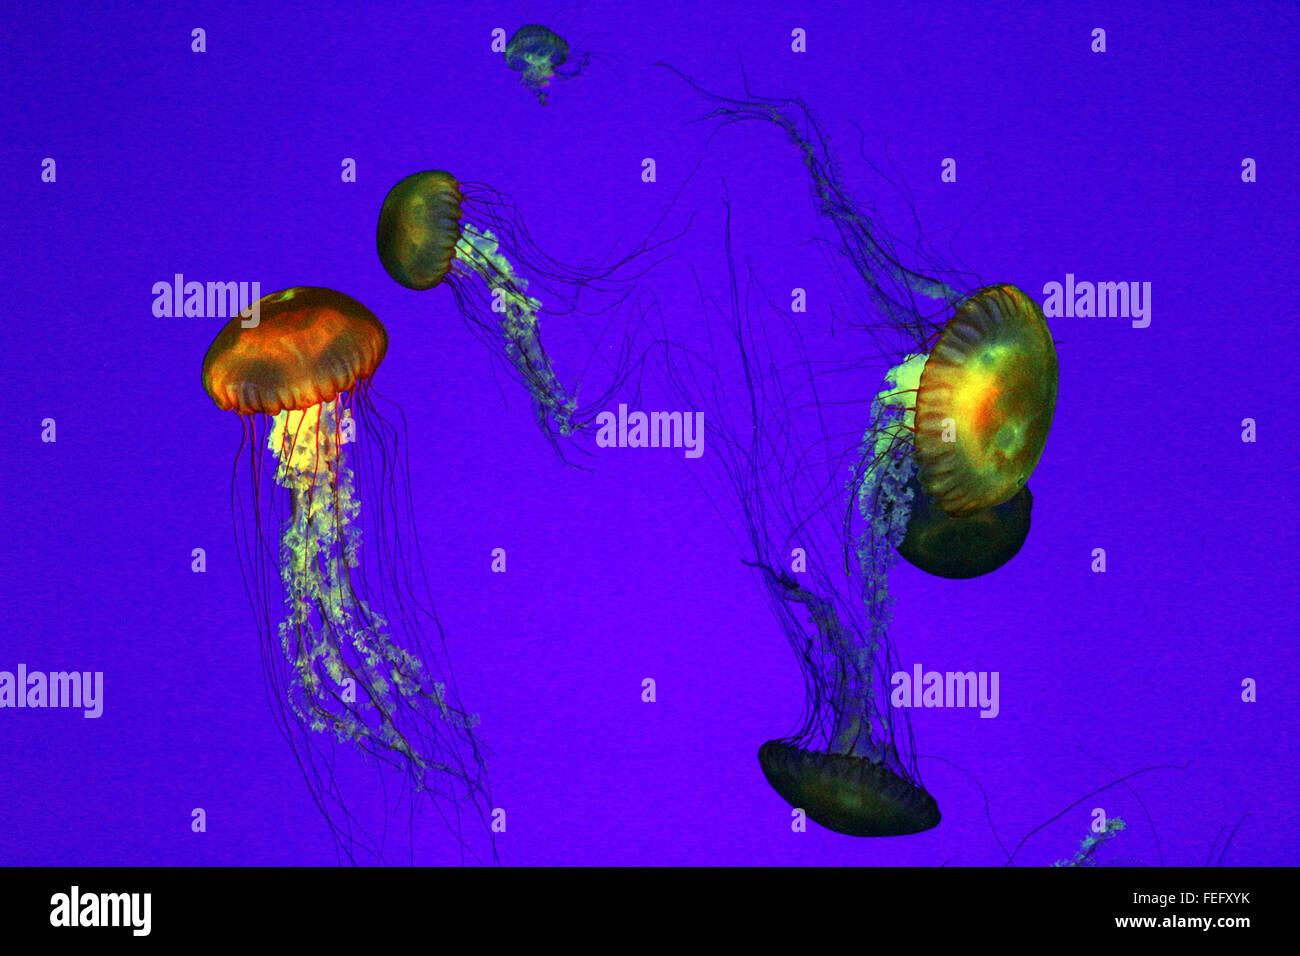 illuminated jellyfish in tank - Stock Image